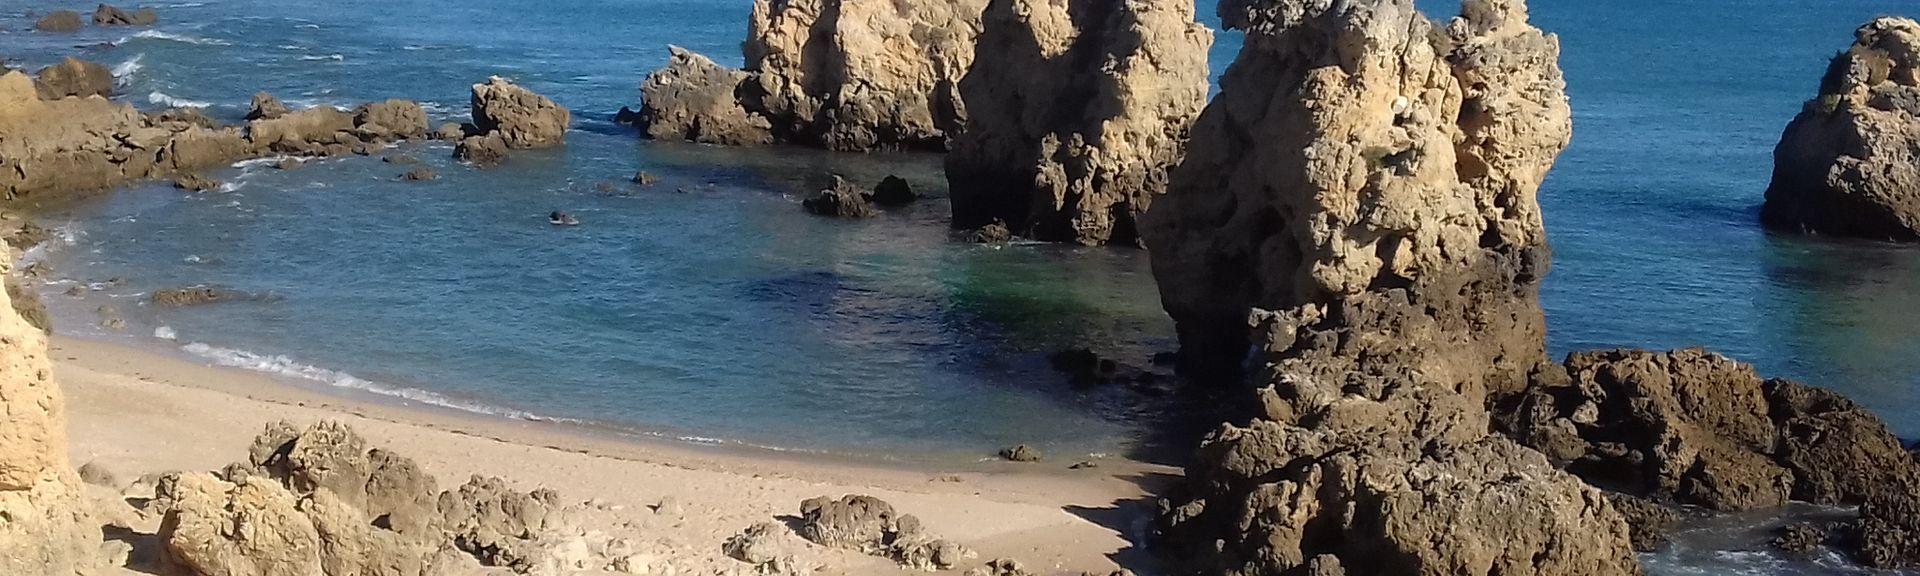 Benafim, District de Faro, Portugal